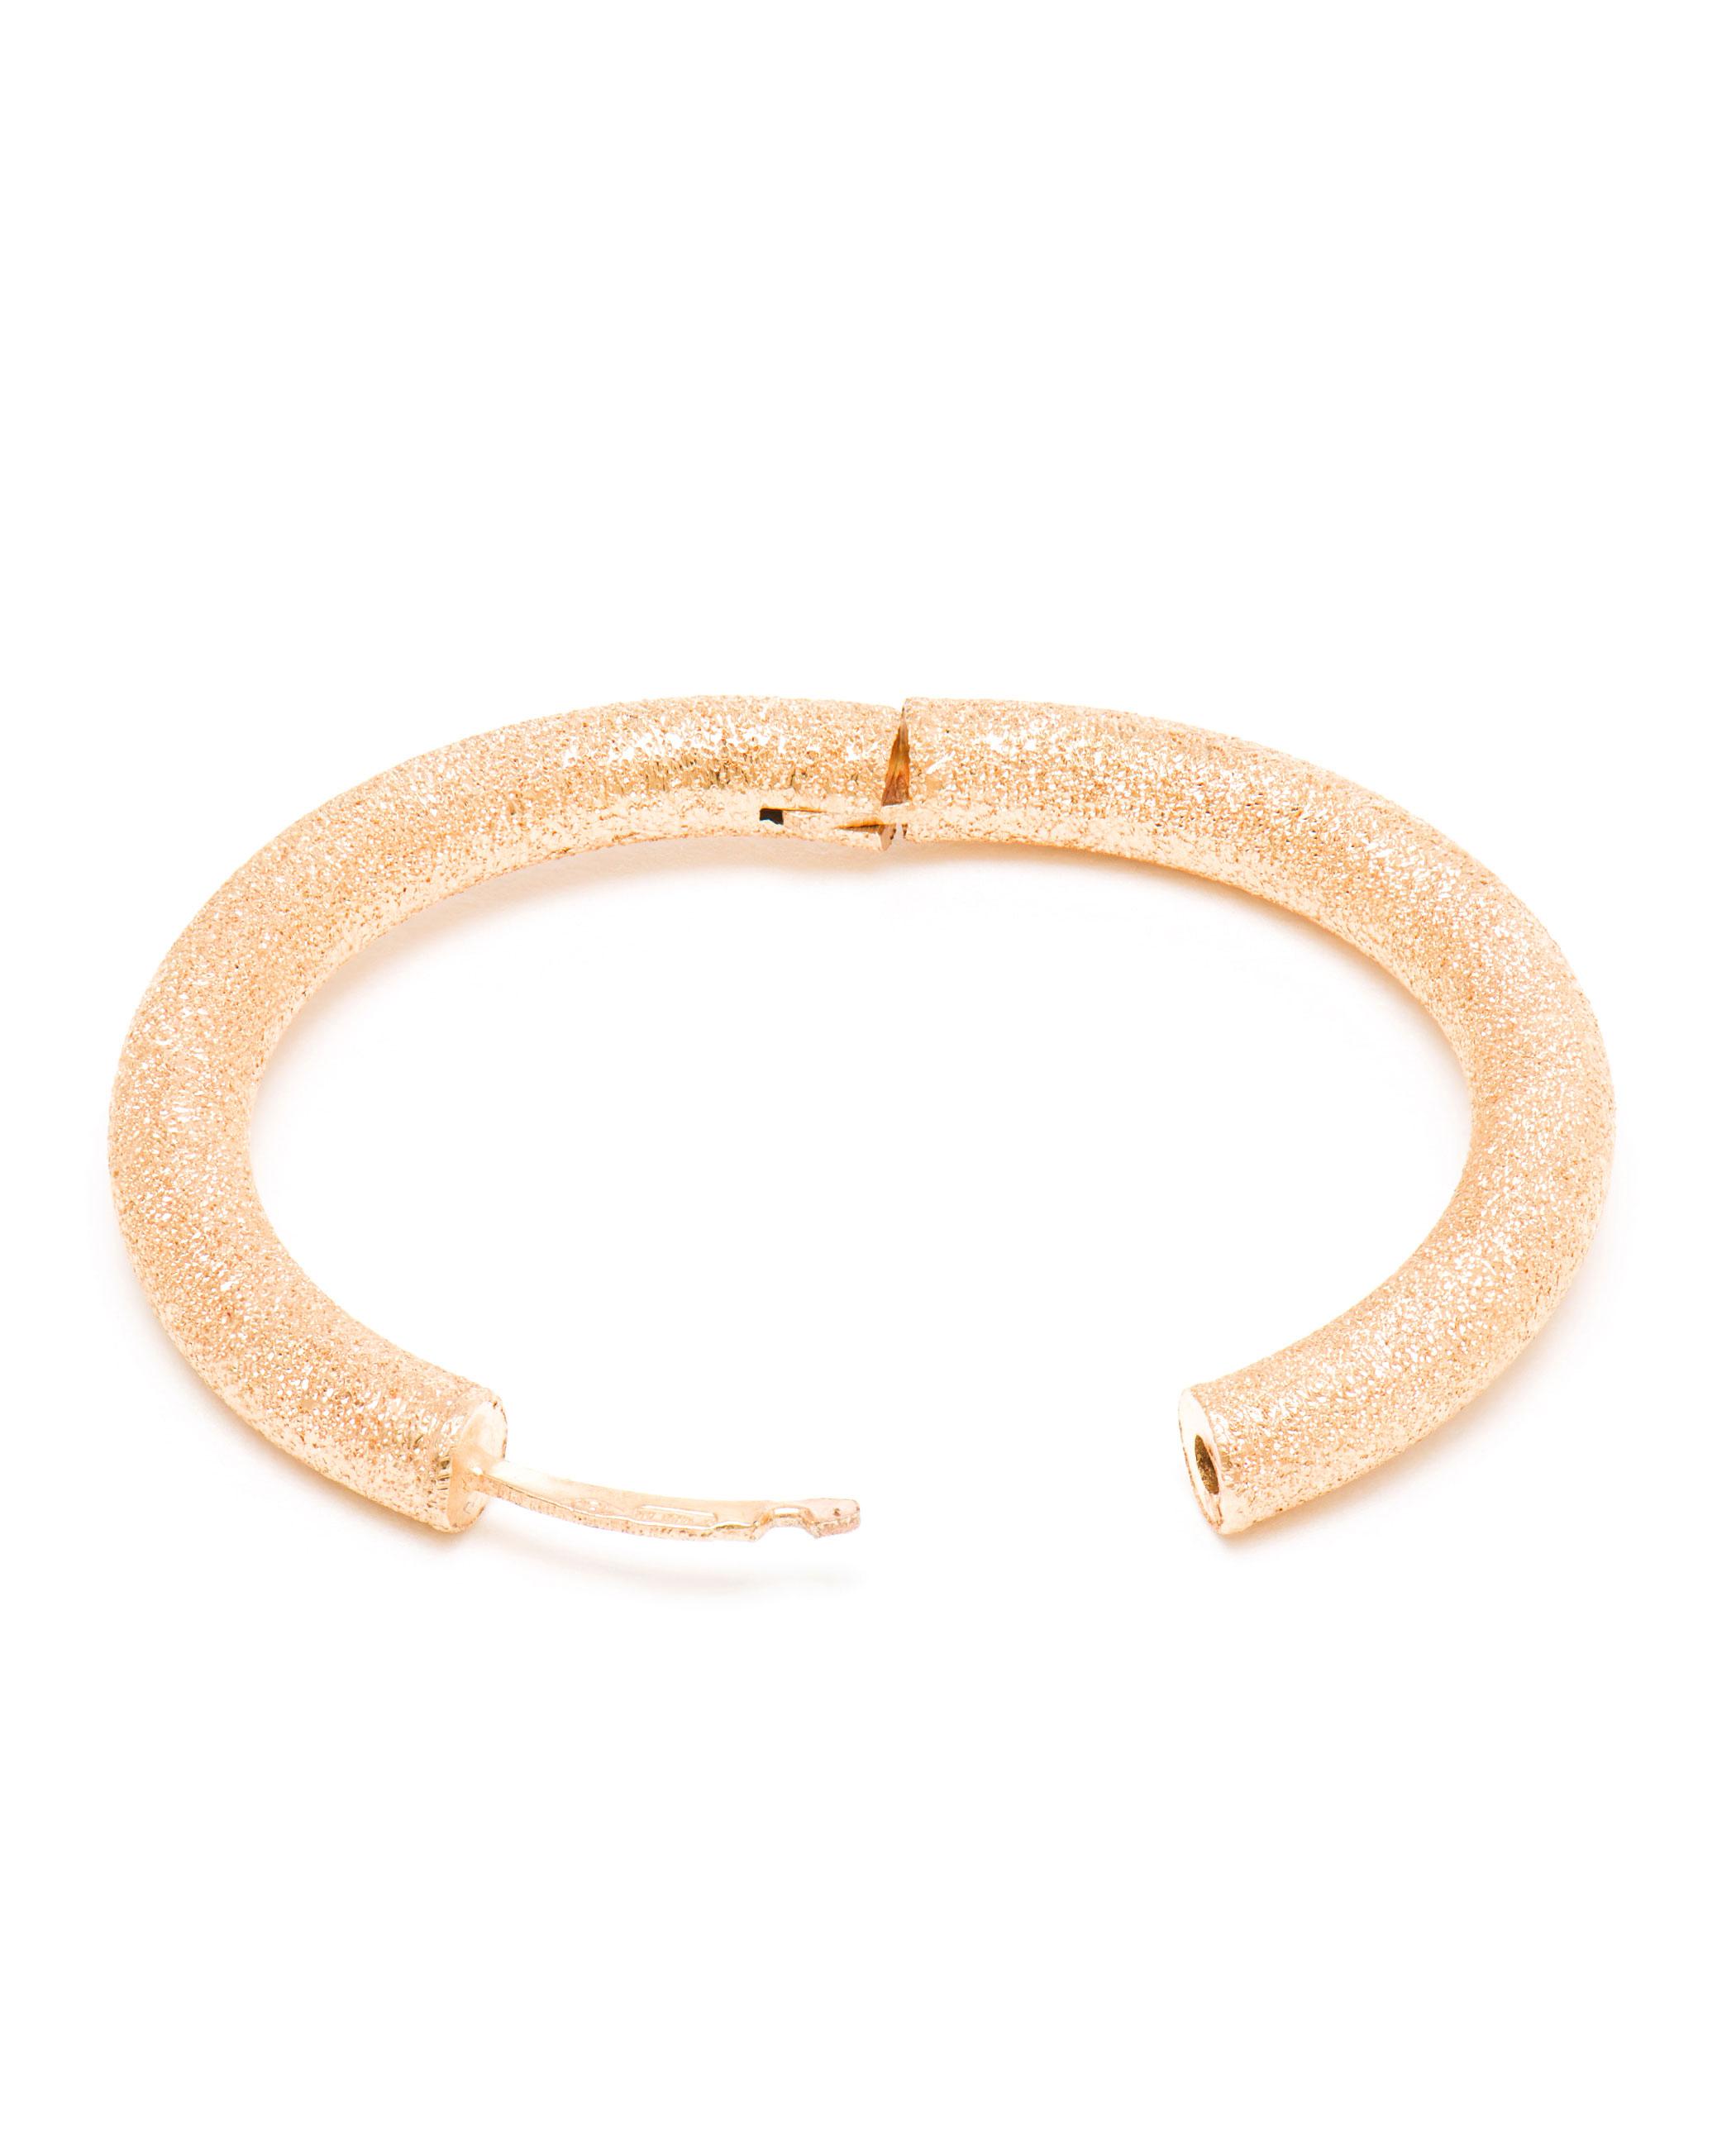 Carolina bucci 18k White Gold Sparkly Hoop Earrings in